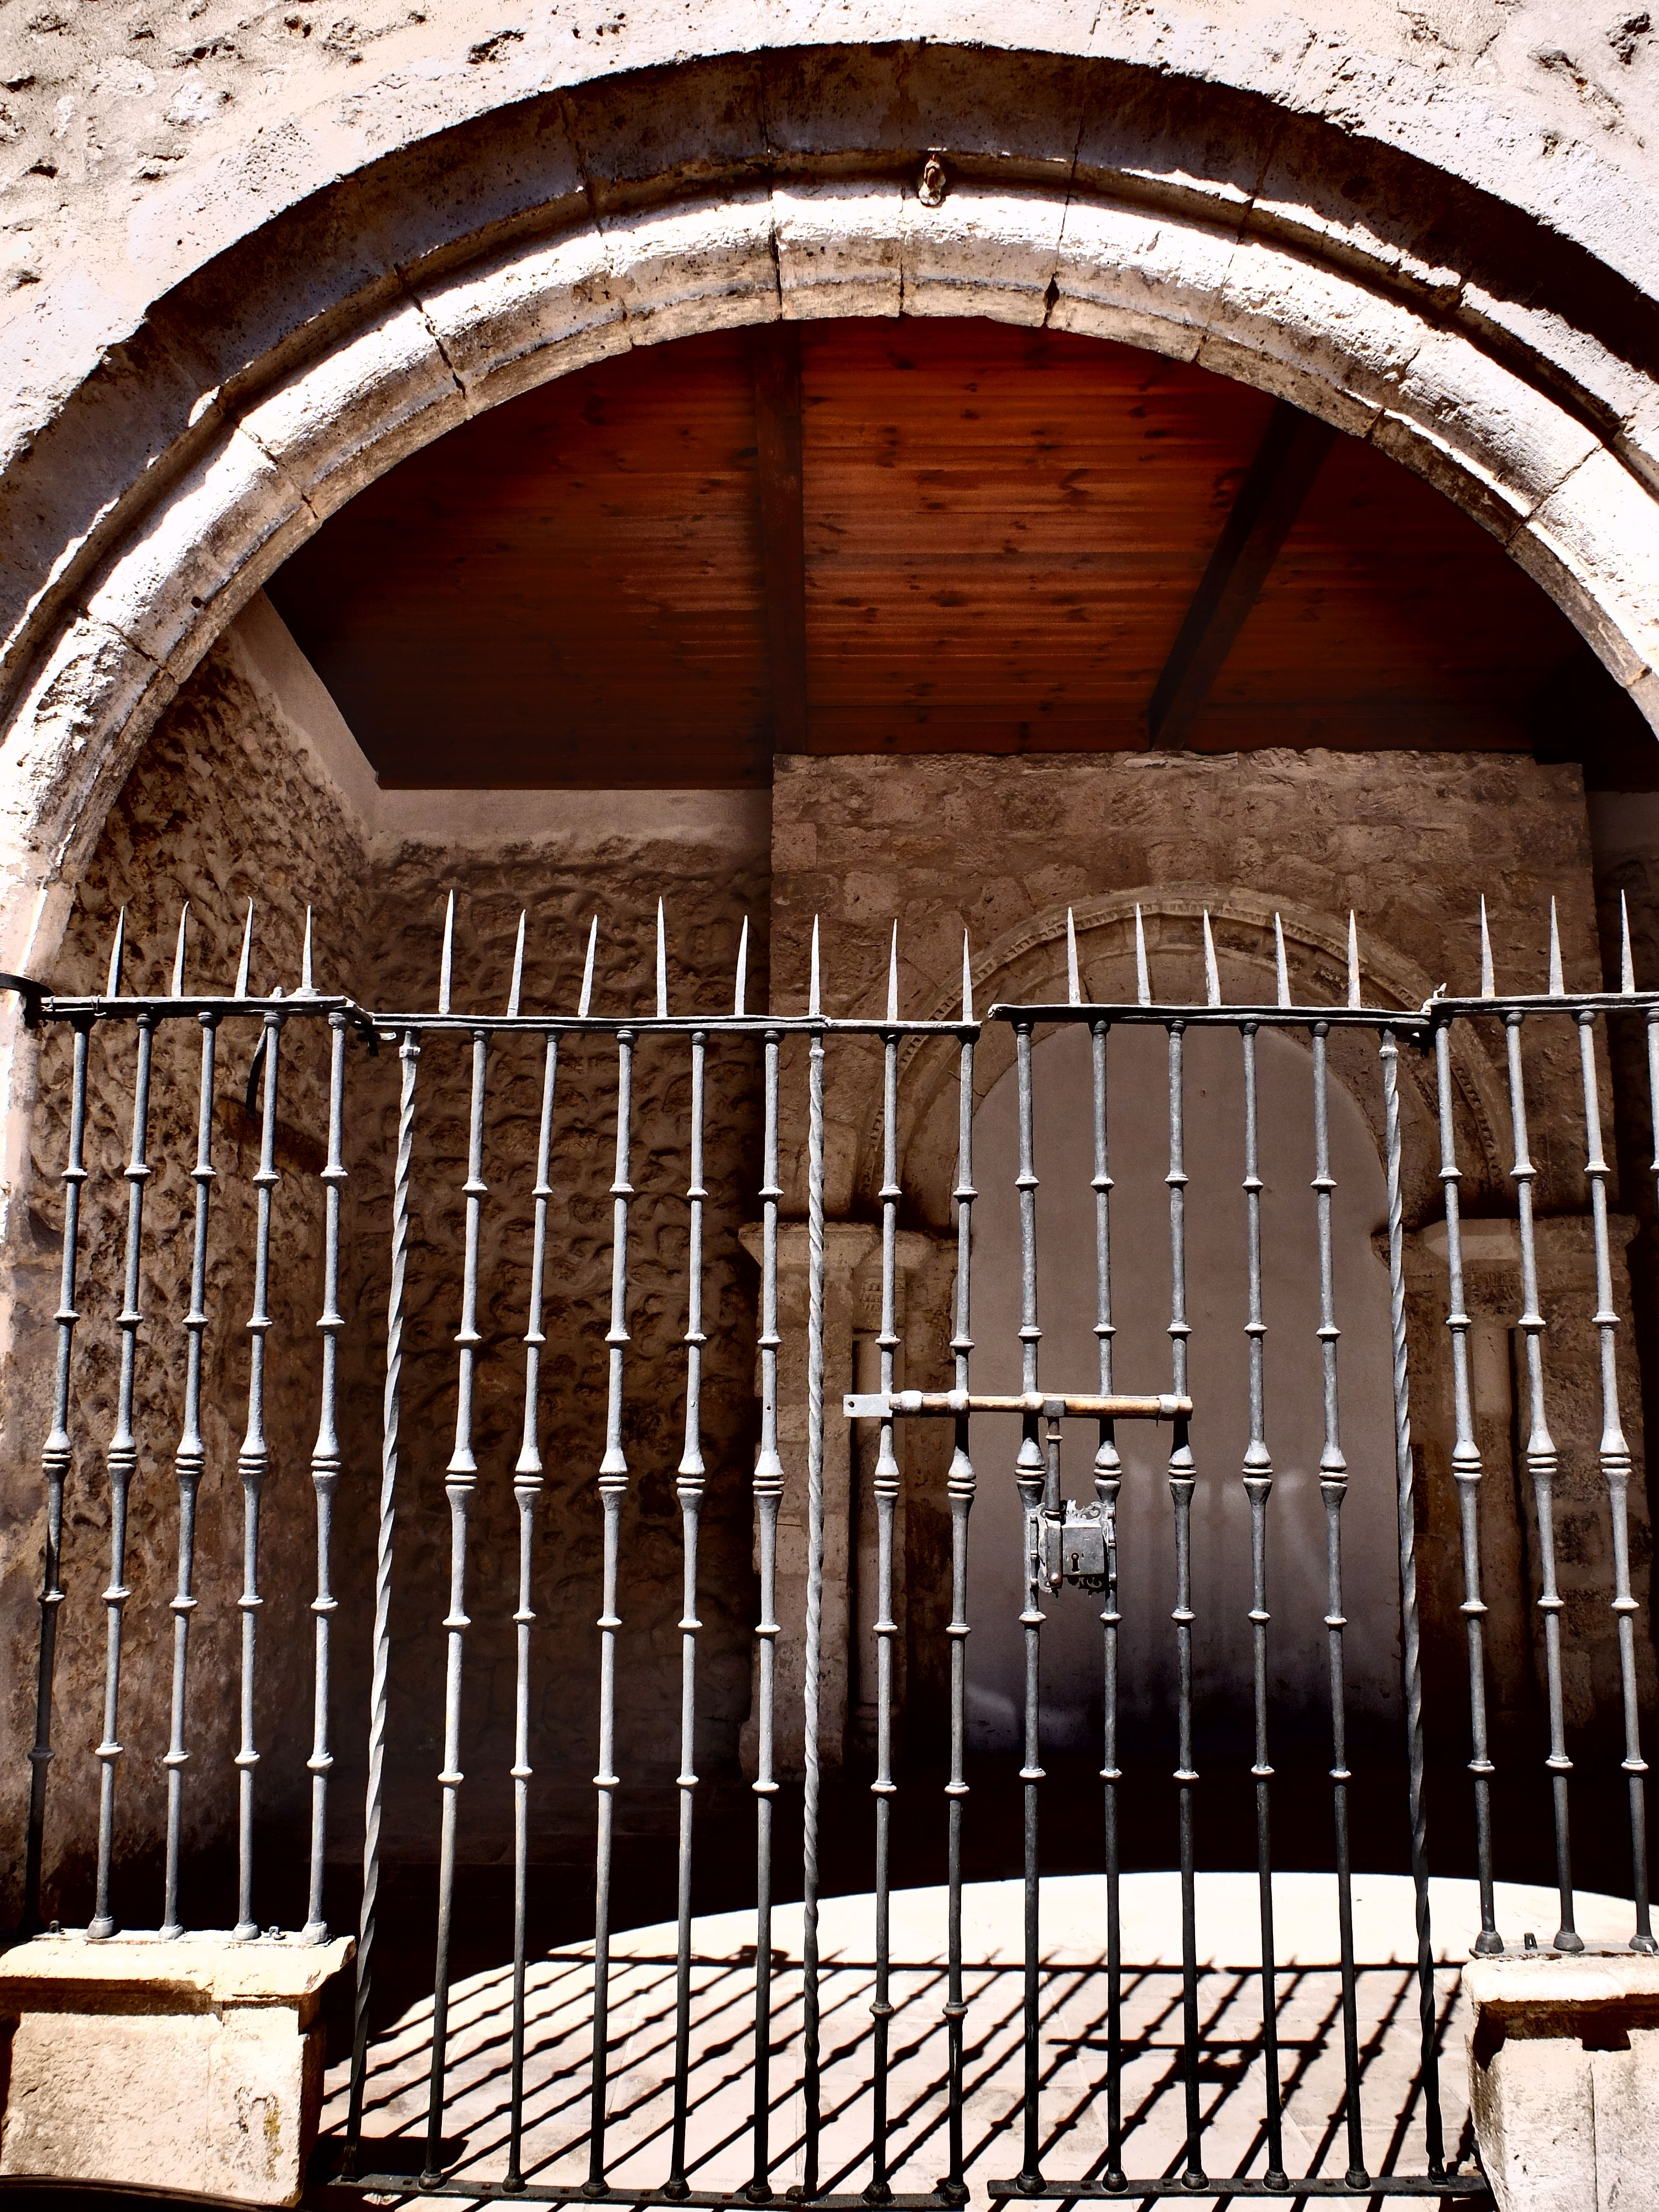 Puerta de la reja y atrio de la iglesia de Santo Tomé